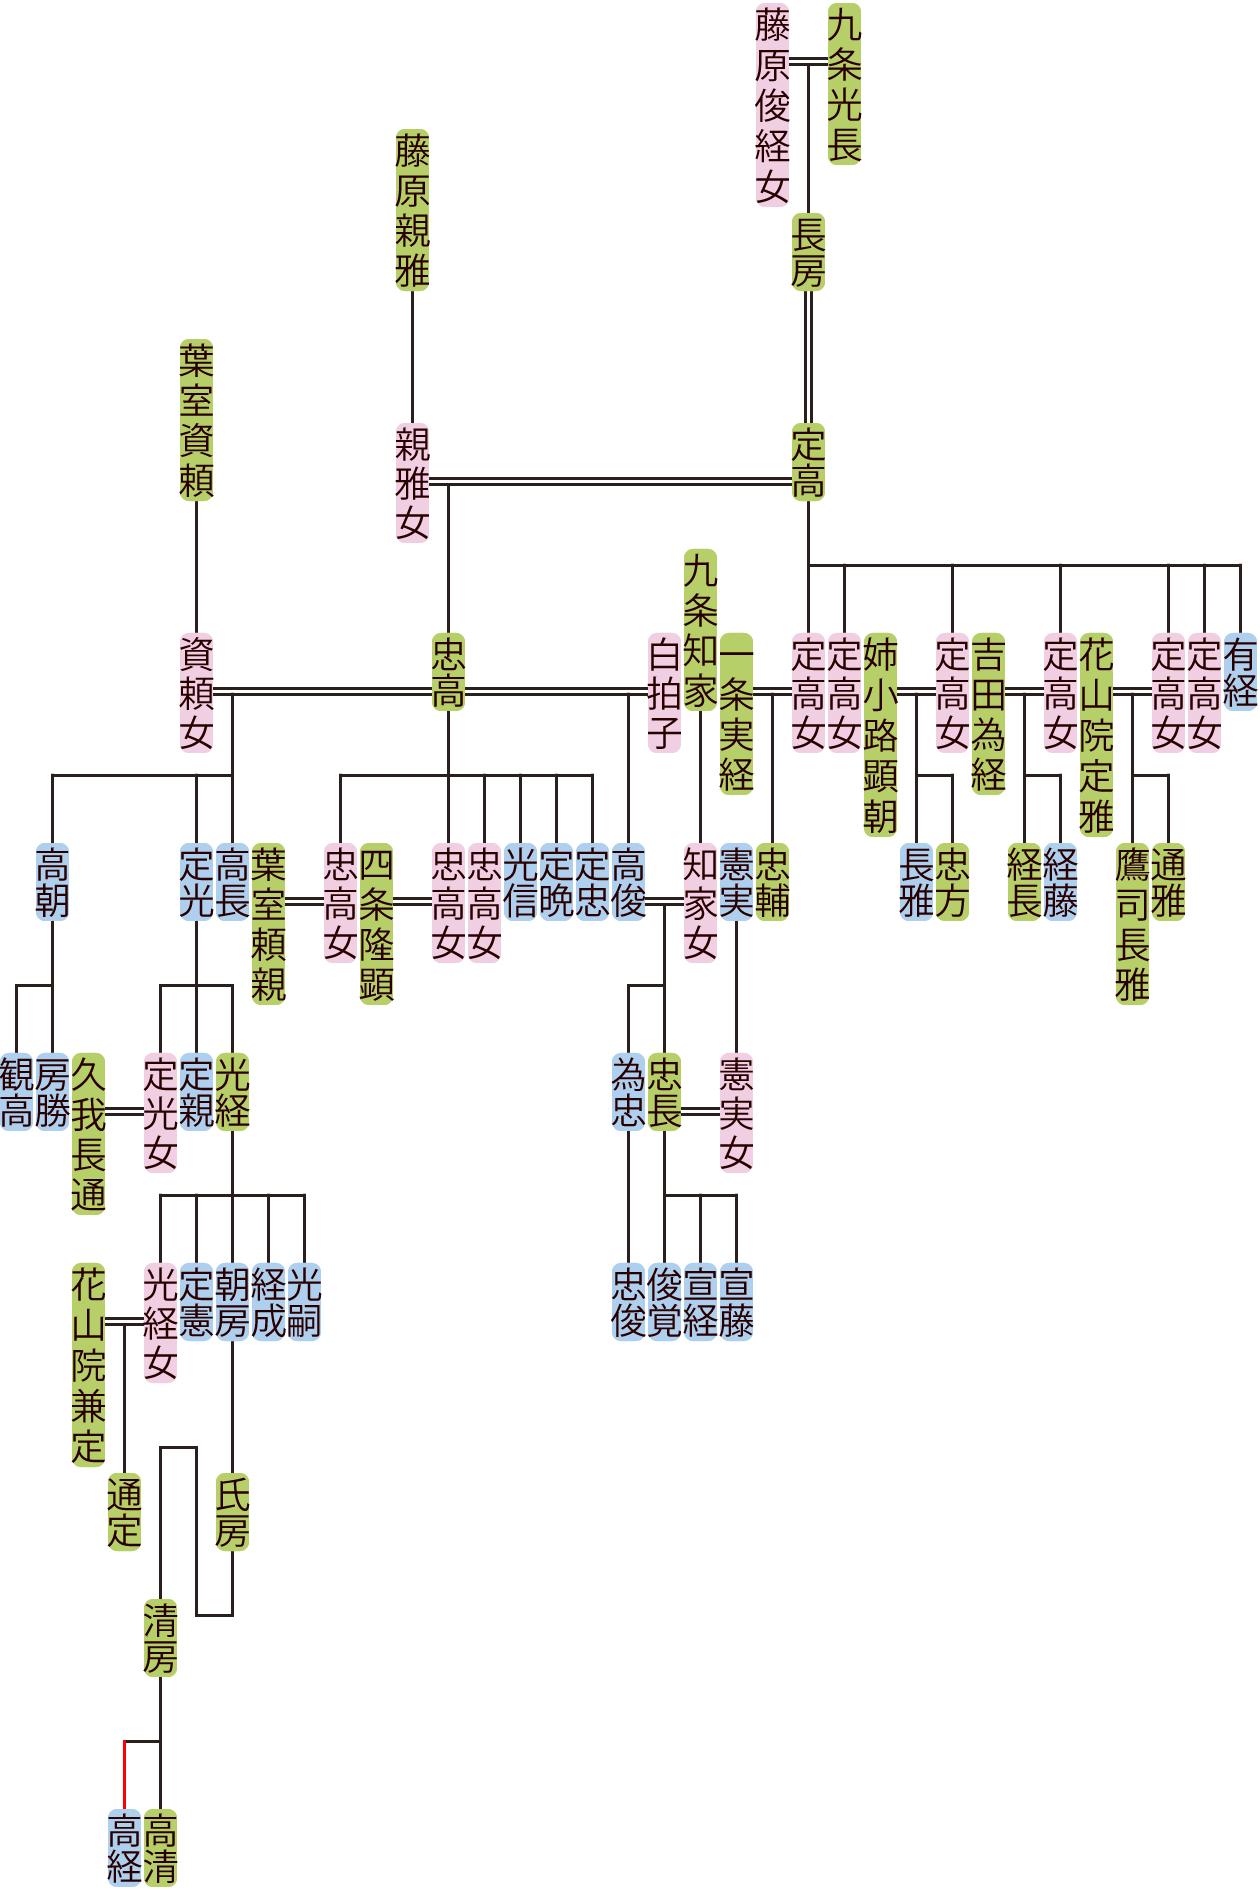 九条定高の系図